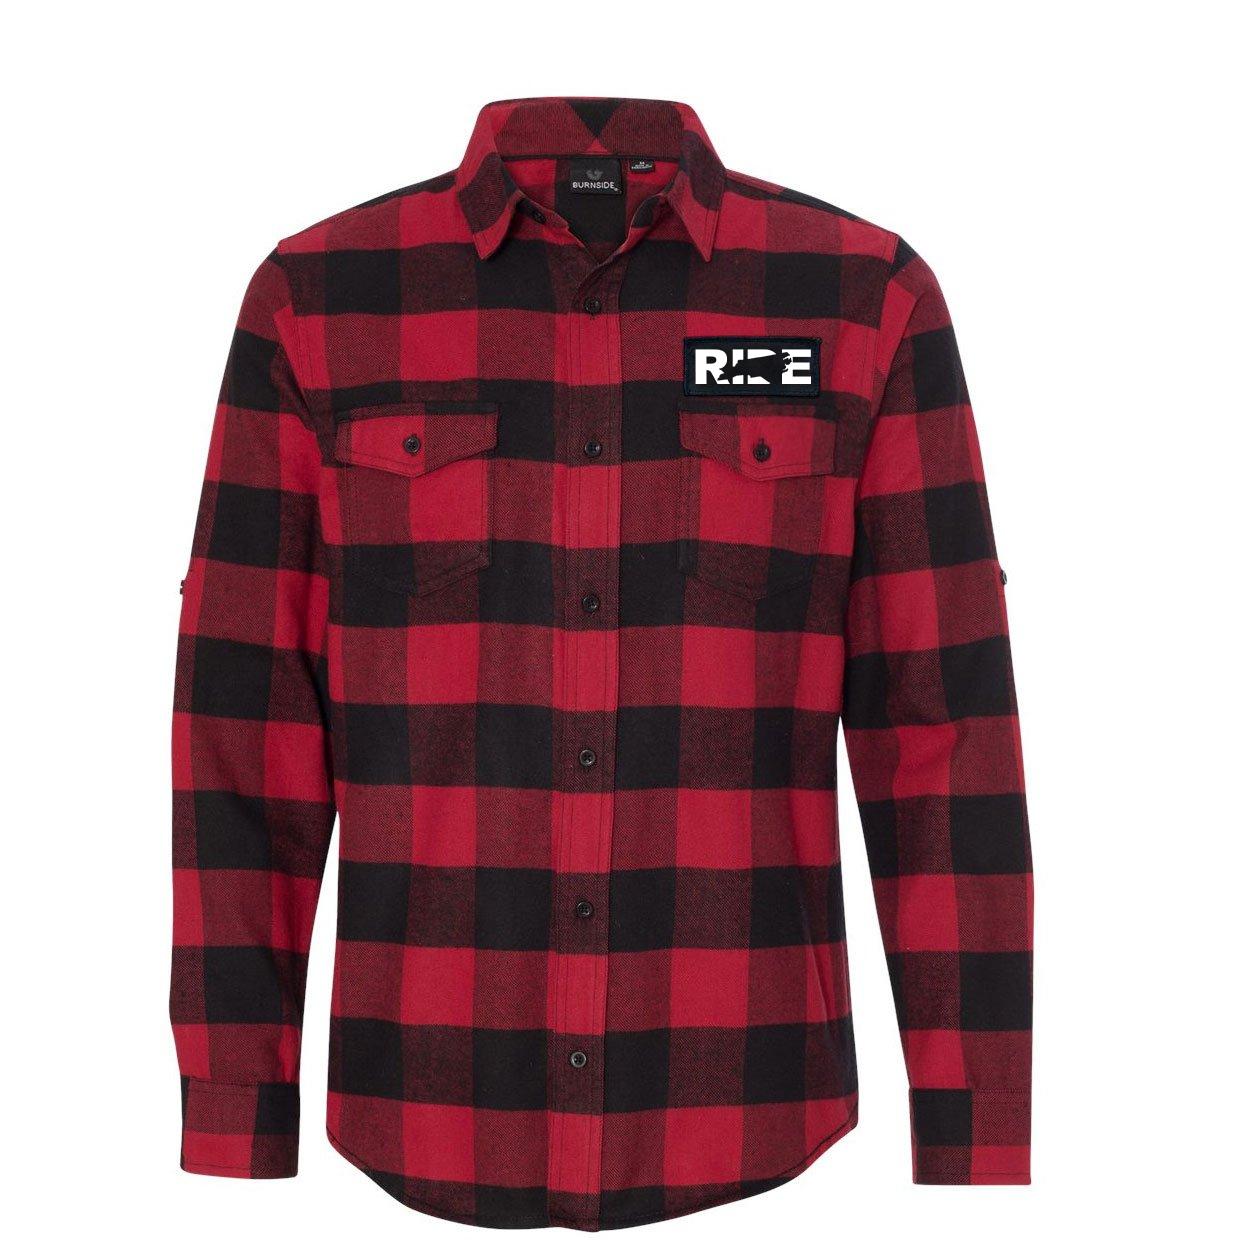 Ride North Carolina Classic Unisex Long Sleeve Woven Patch Flannel Shirt Red/Black Buffalo (White Logo)